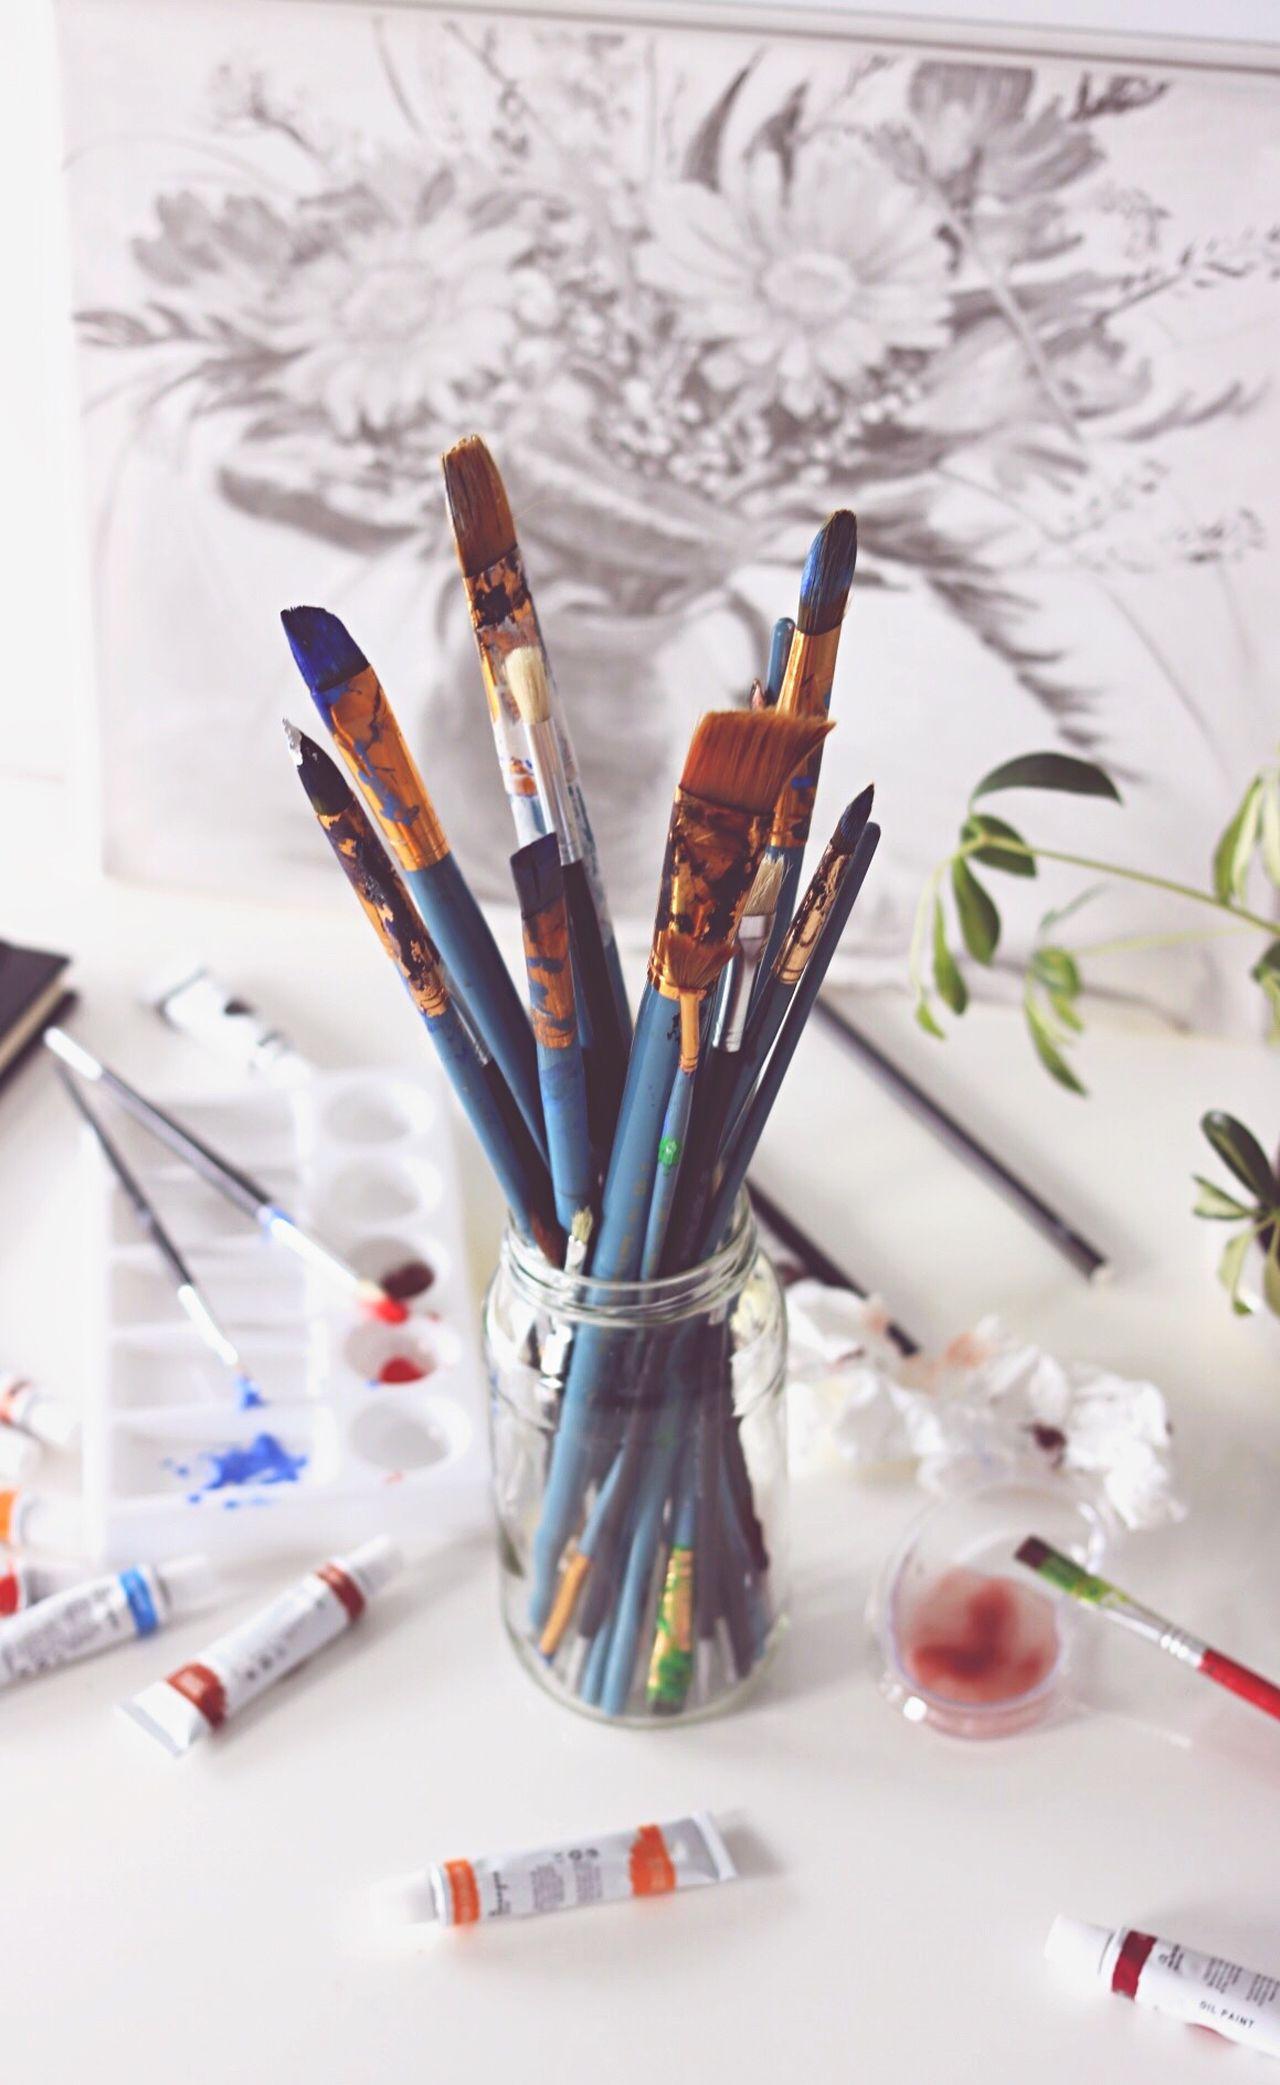 Creativity Art And Craft Paintbrush Indoors  Equipment Studio Artist Palette Education Multi Colored Art Product Desk Organizer Writing Instrument Close-up Day Art Class